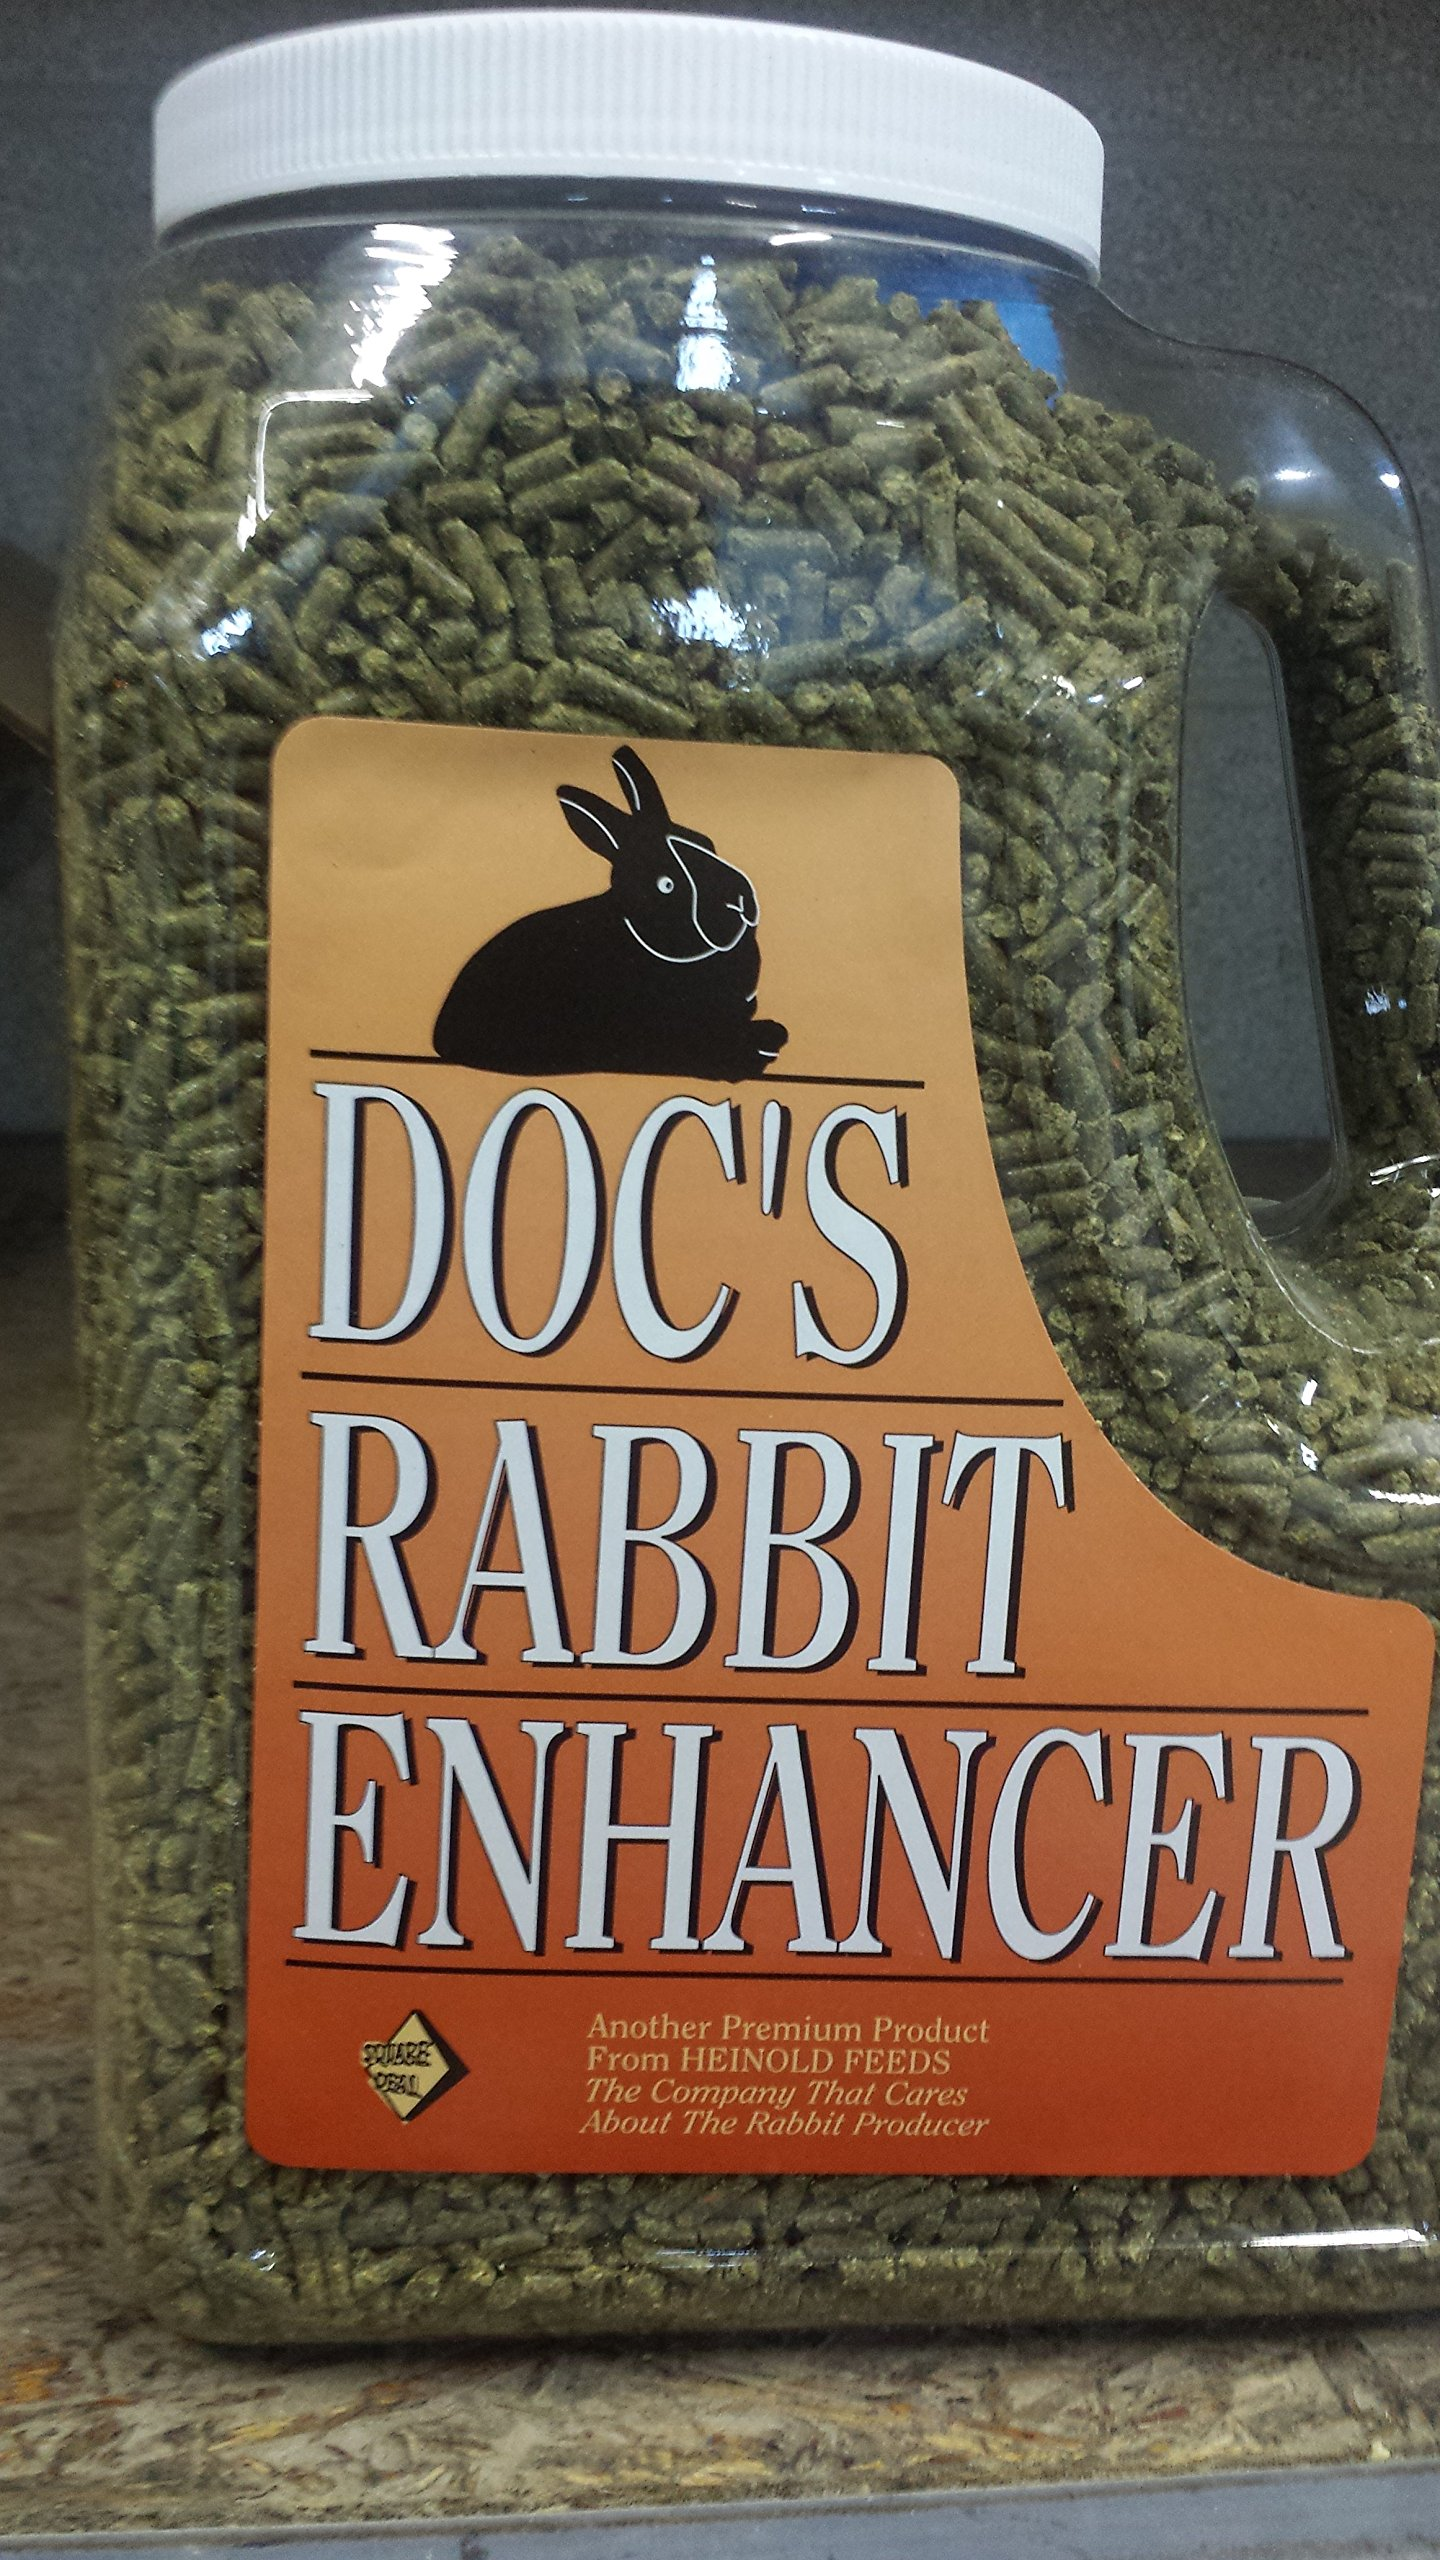 Doc's Rabbit Enhancer